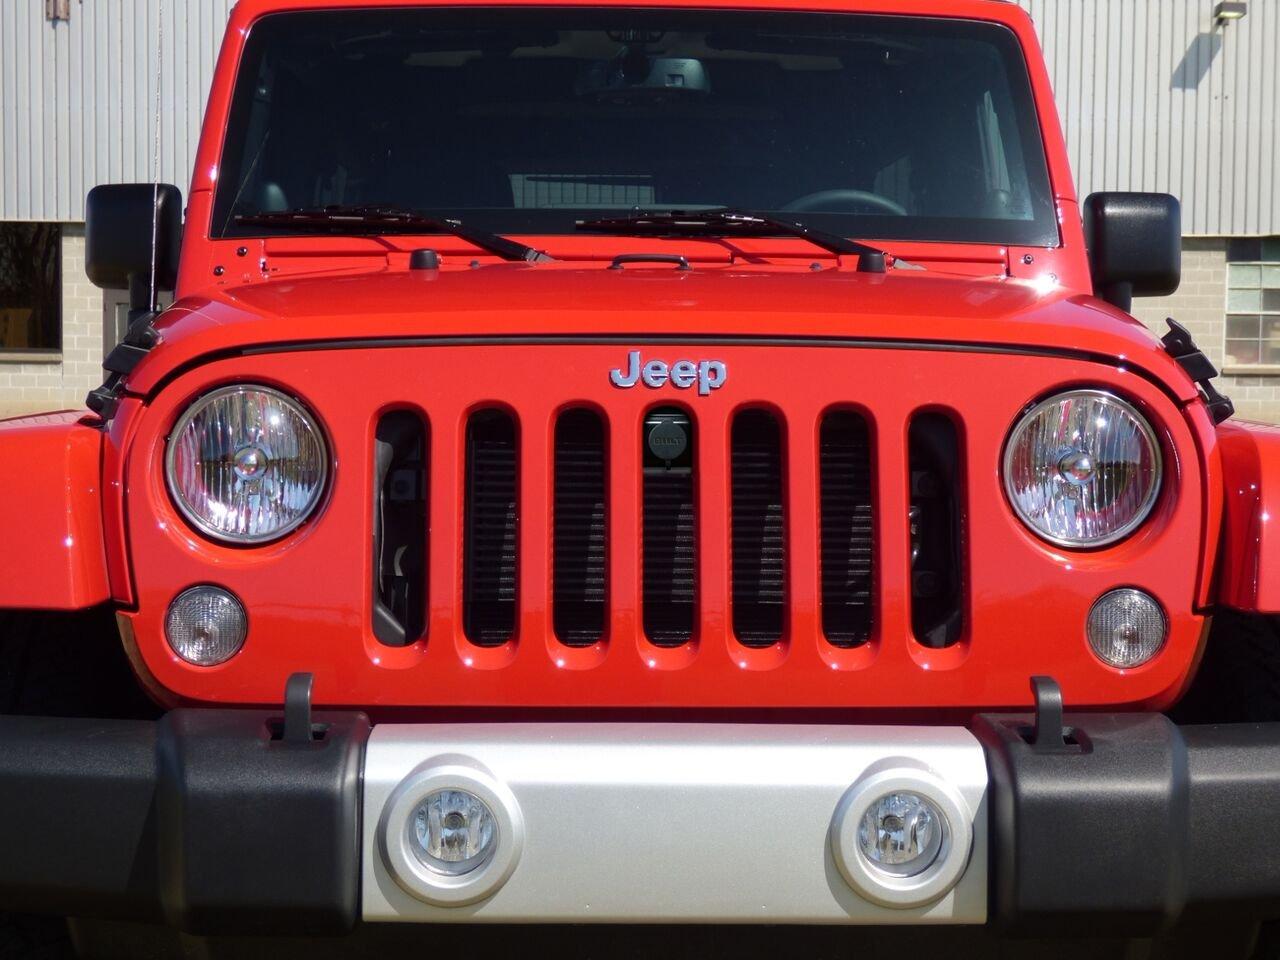 Bolt 7026128 Jeep Wrangler Jk Hood Lock Hitch Locks Amazon Canada Fuel Filter